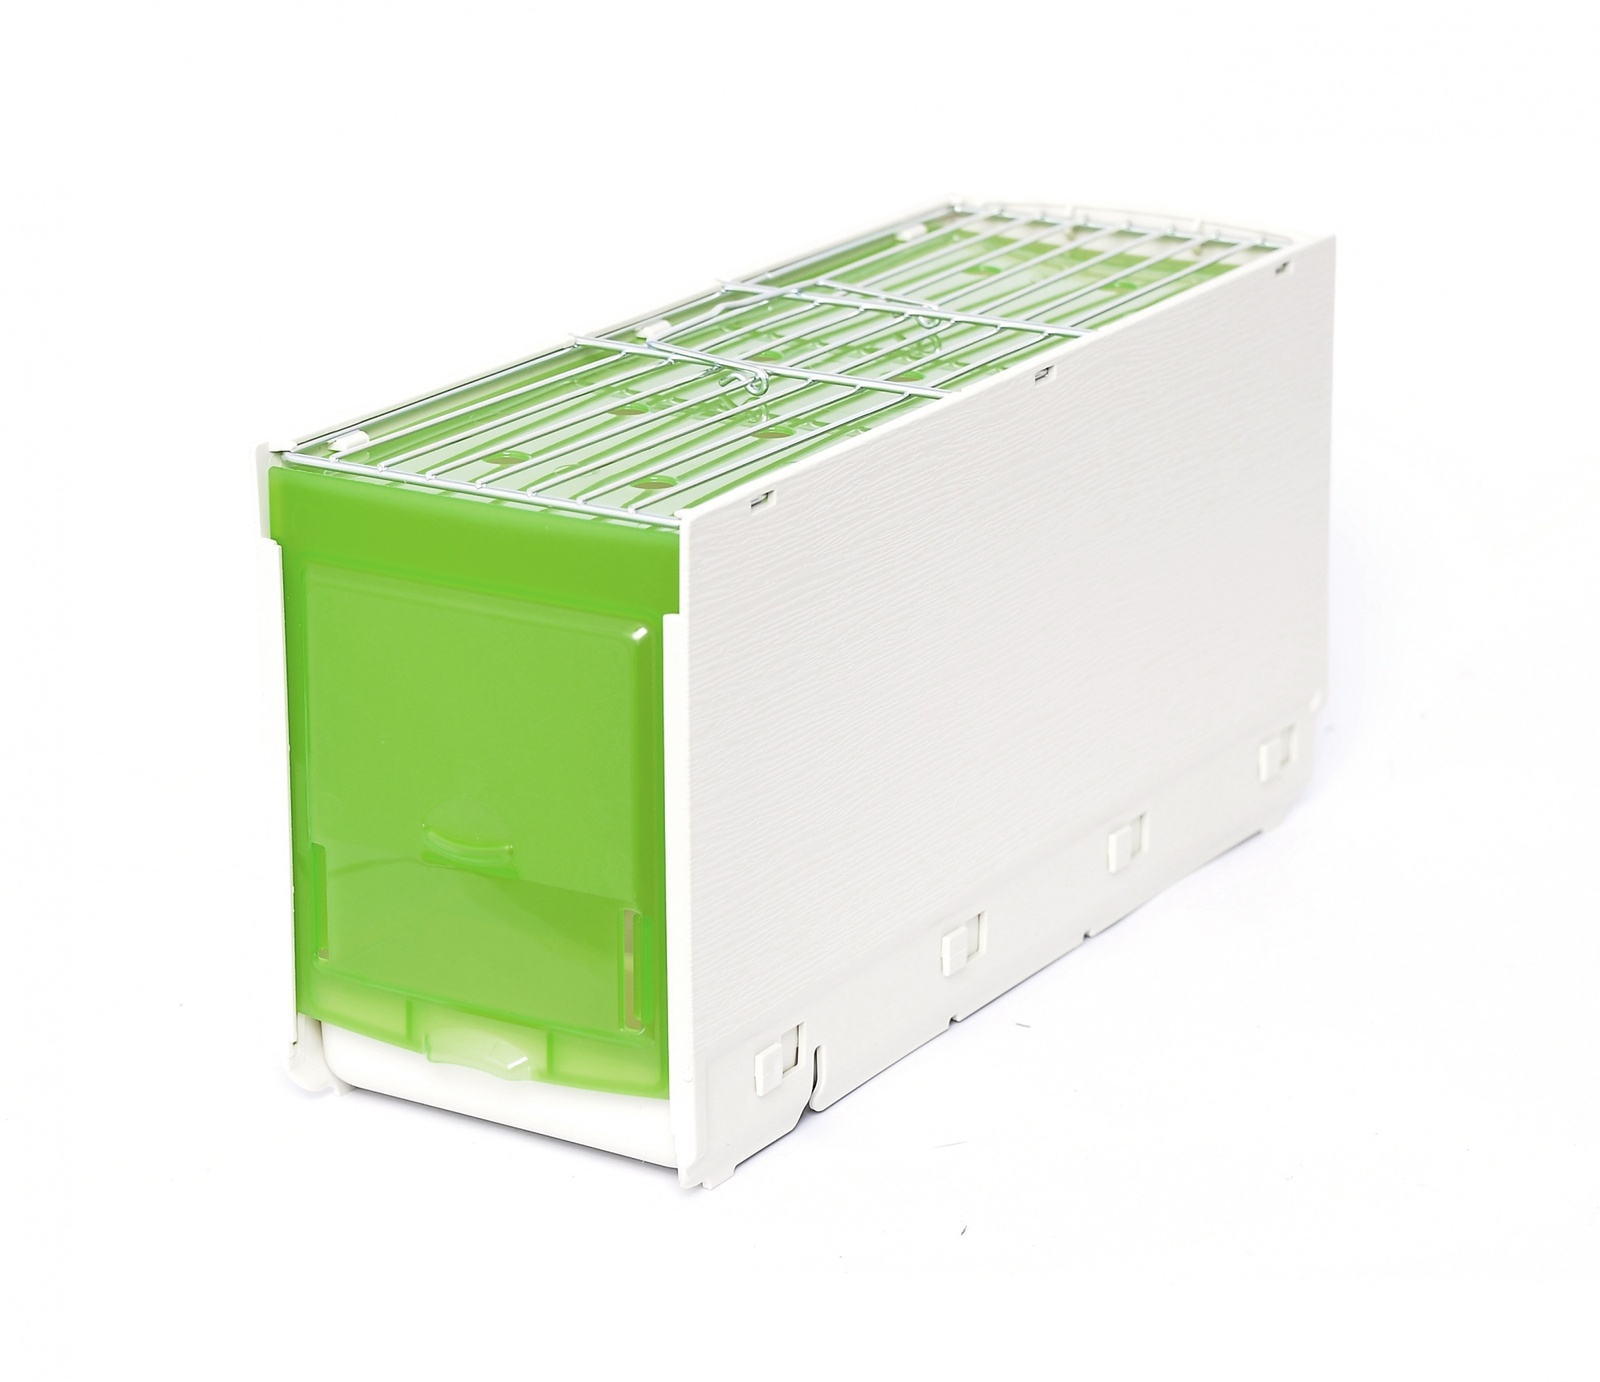 Benelux Переноска для птиц пластиковая 20 * 11 * 14 см (Transportcage plastic medium) 14776 от Ravta